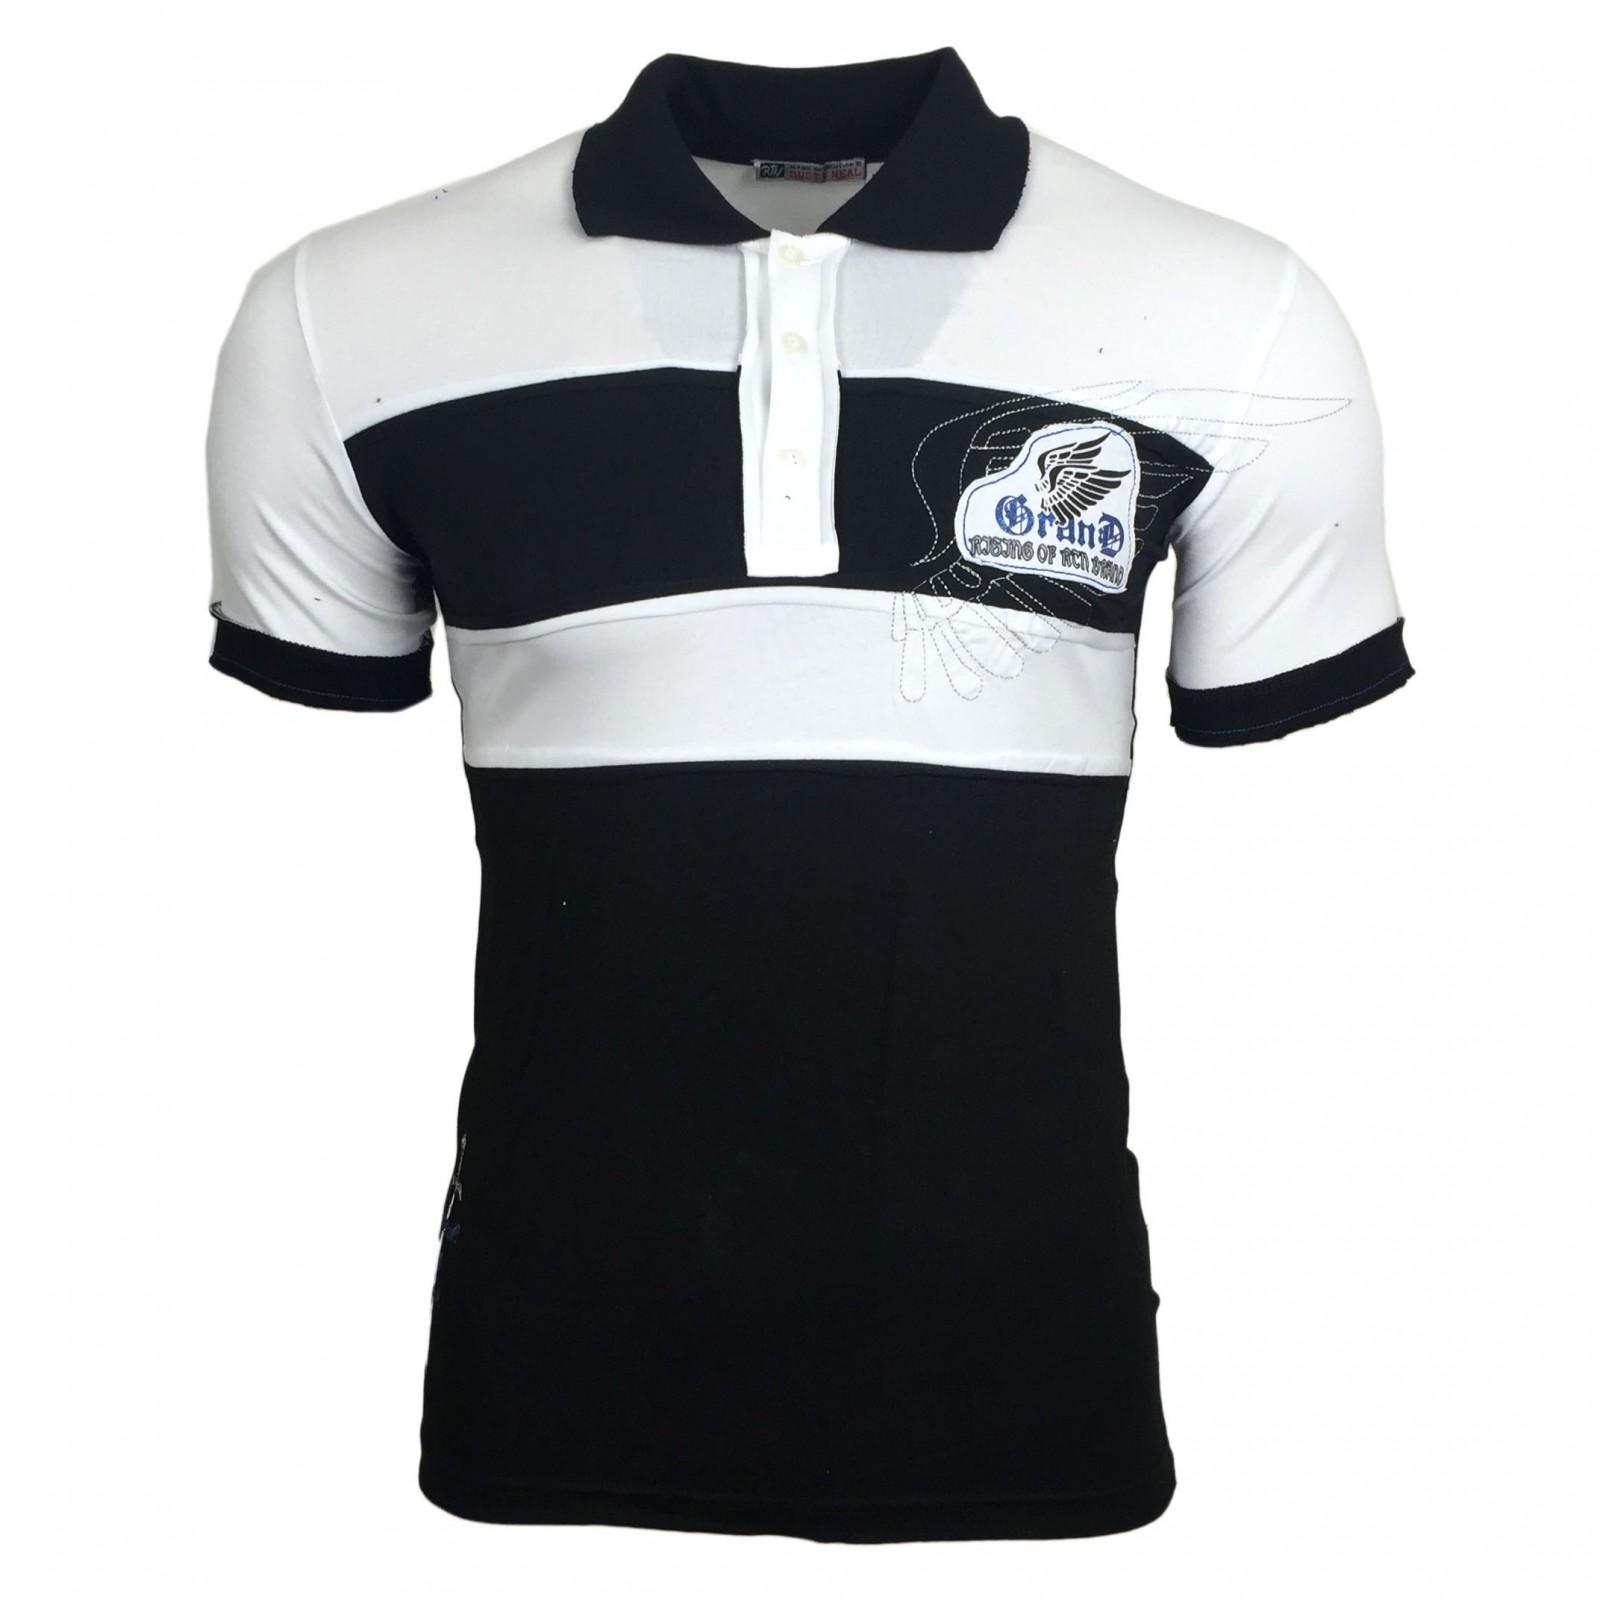 Polo T-Shirt 402 Rusty Neal